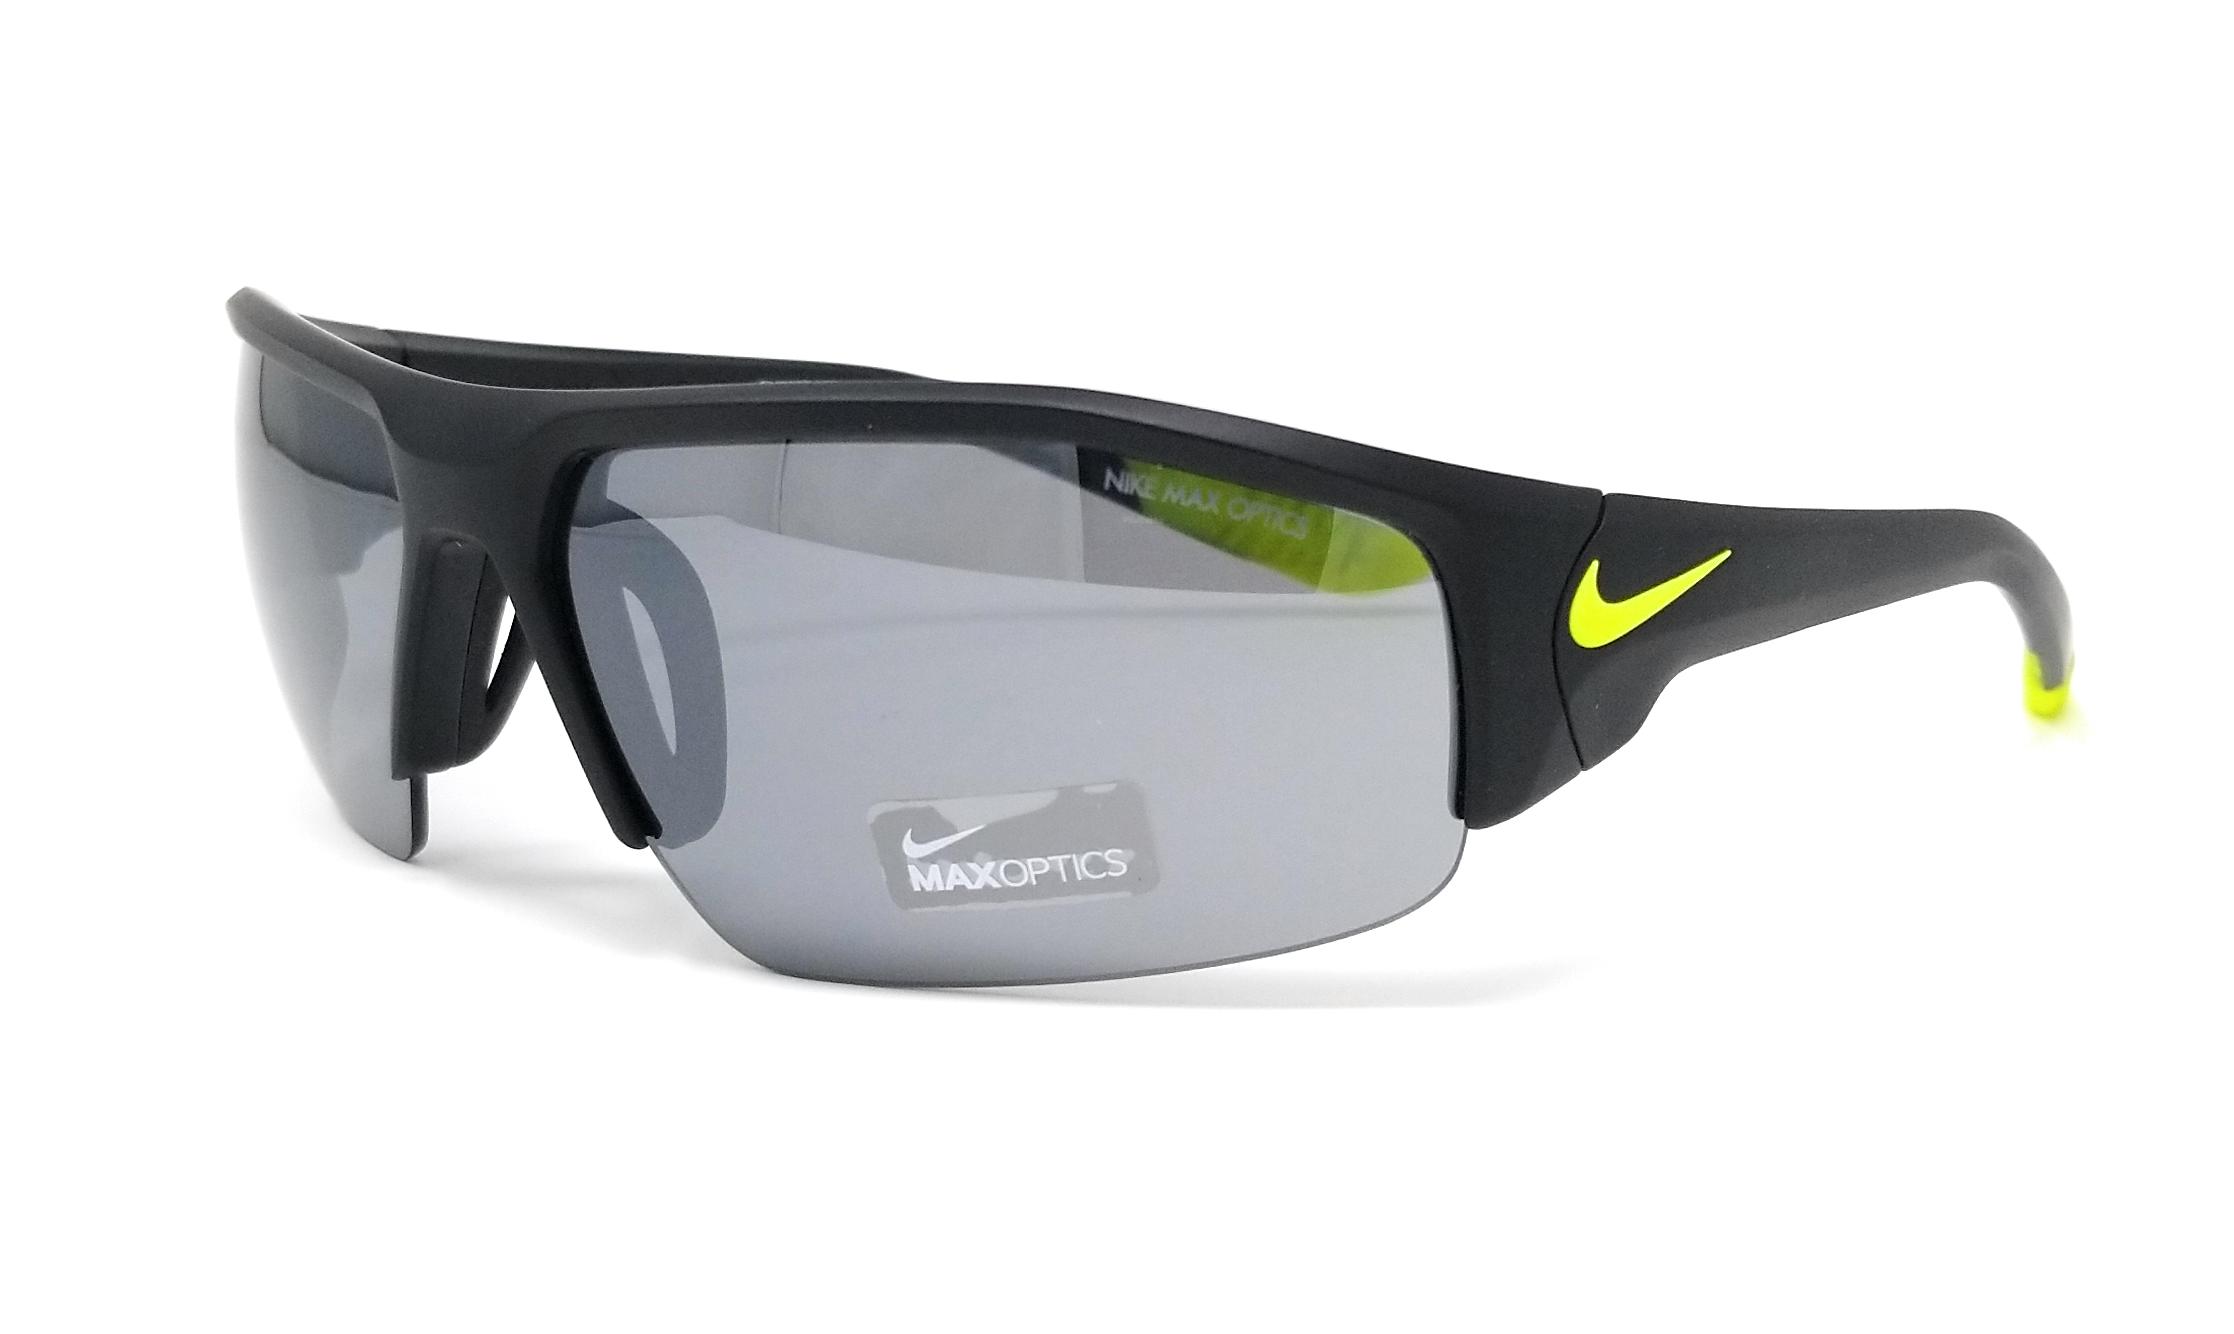 6b6d2641fe Details about NIKE Sunglasses SKYLON ACE XV EV0857 007 Matte Black  Rectangle 75x14x130